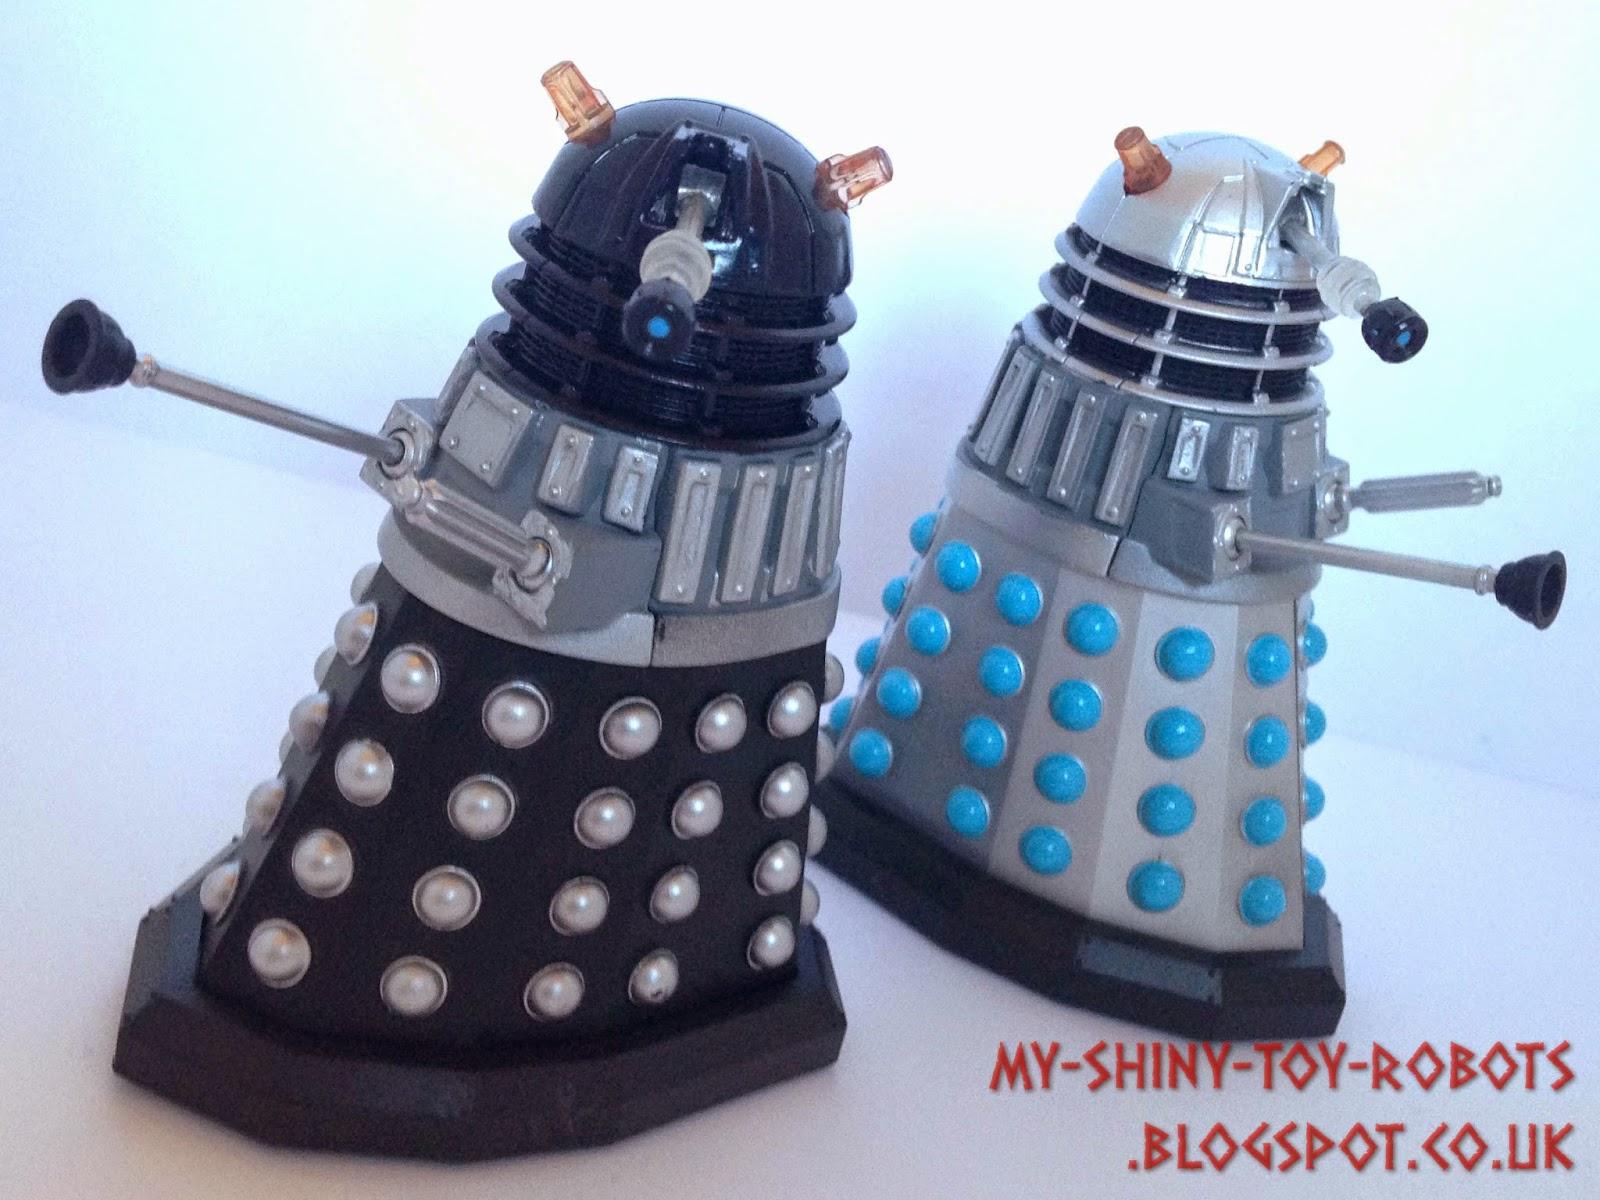 Posing the Daleks